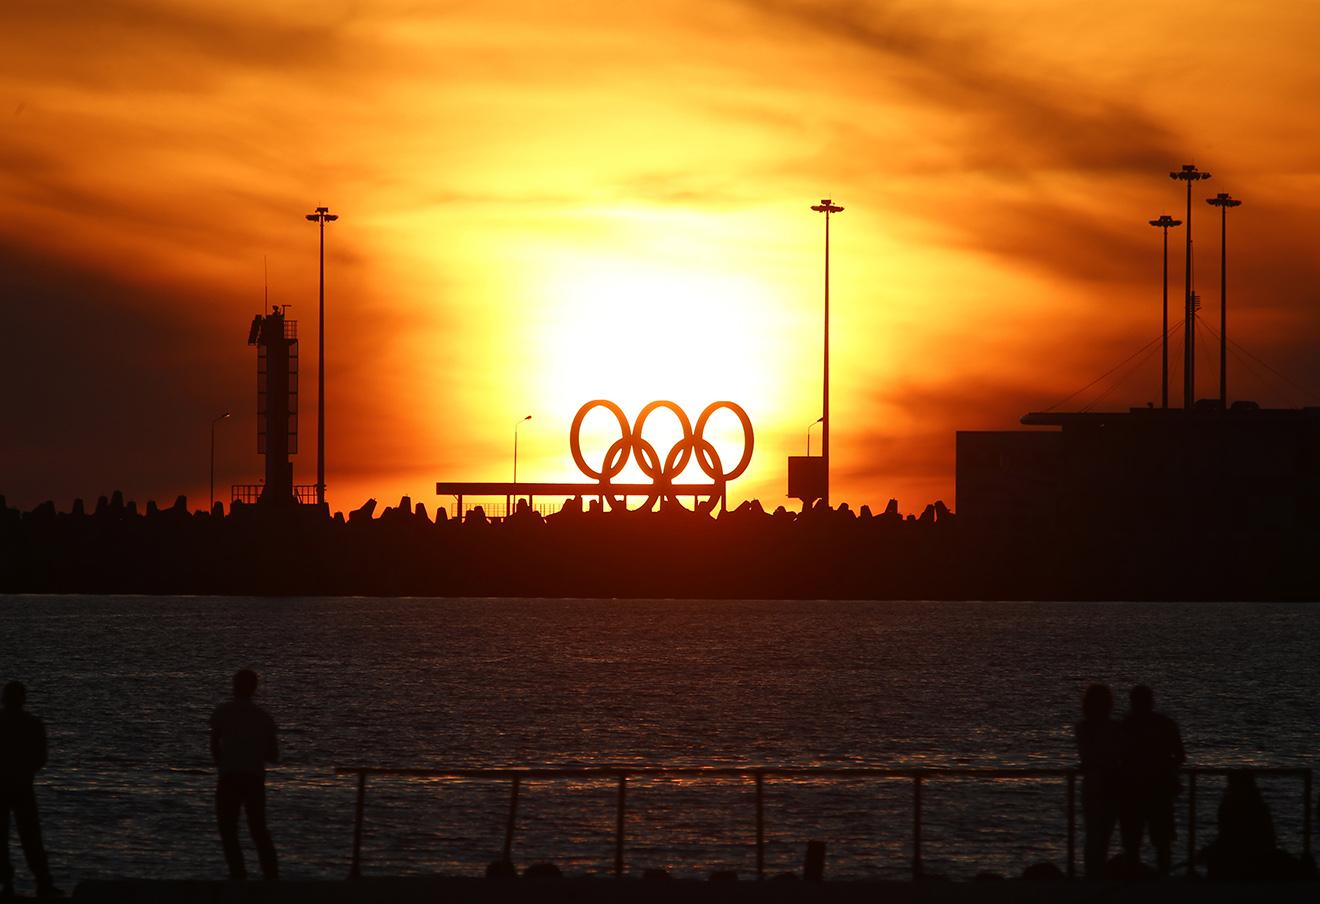 Вид на Олимпийские кольца на набережной Сочи. Фото: Валерий Матыцин / ТАСС